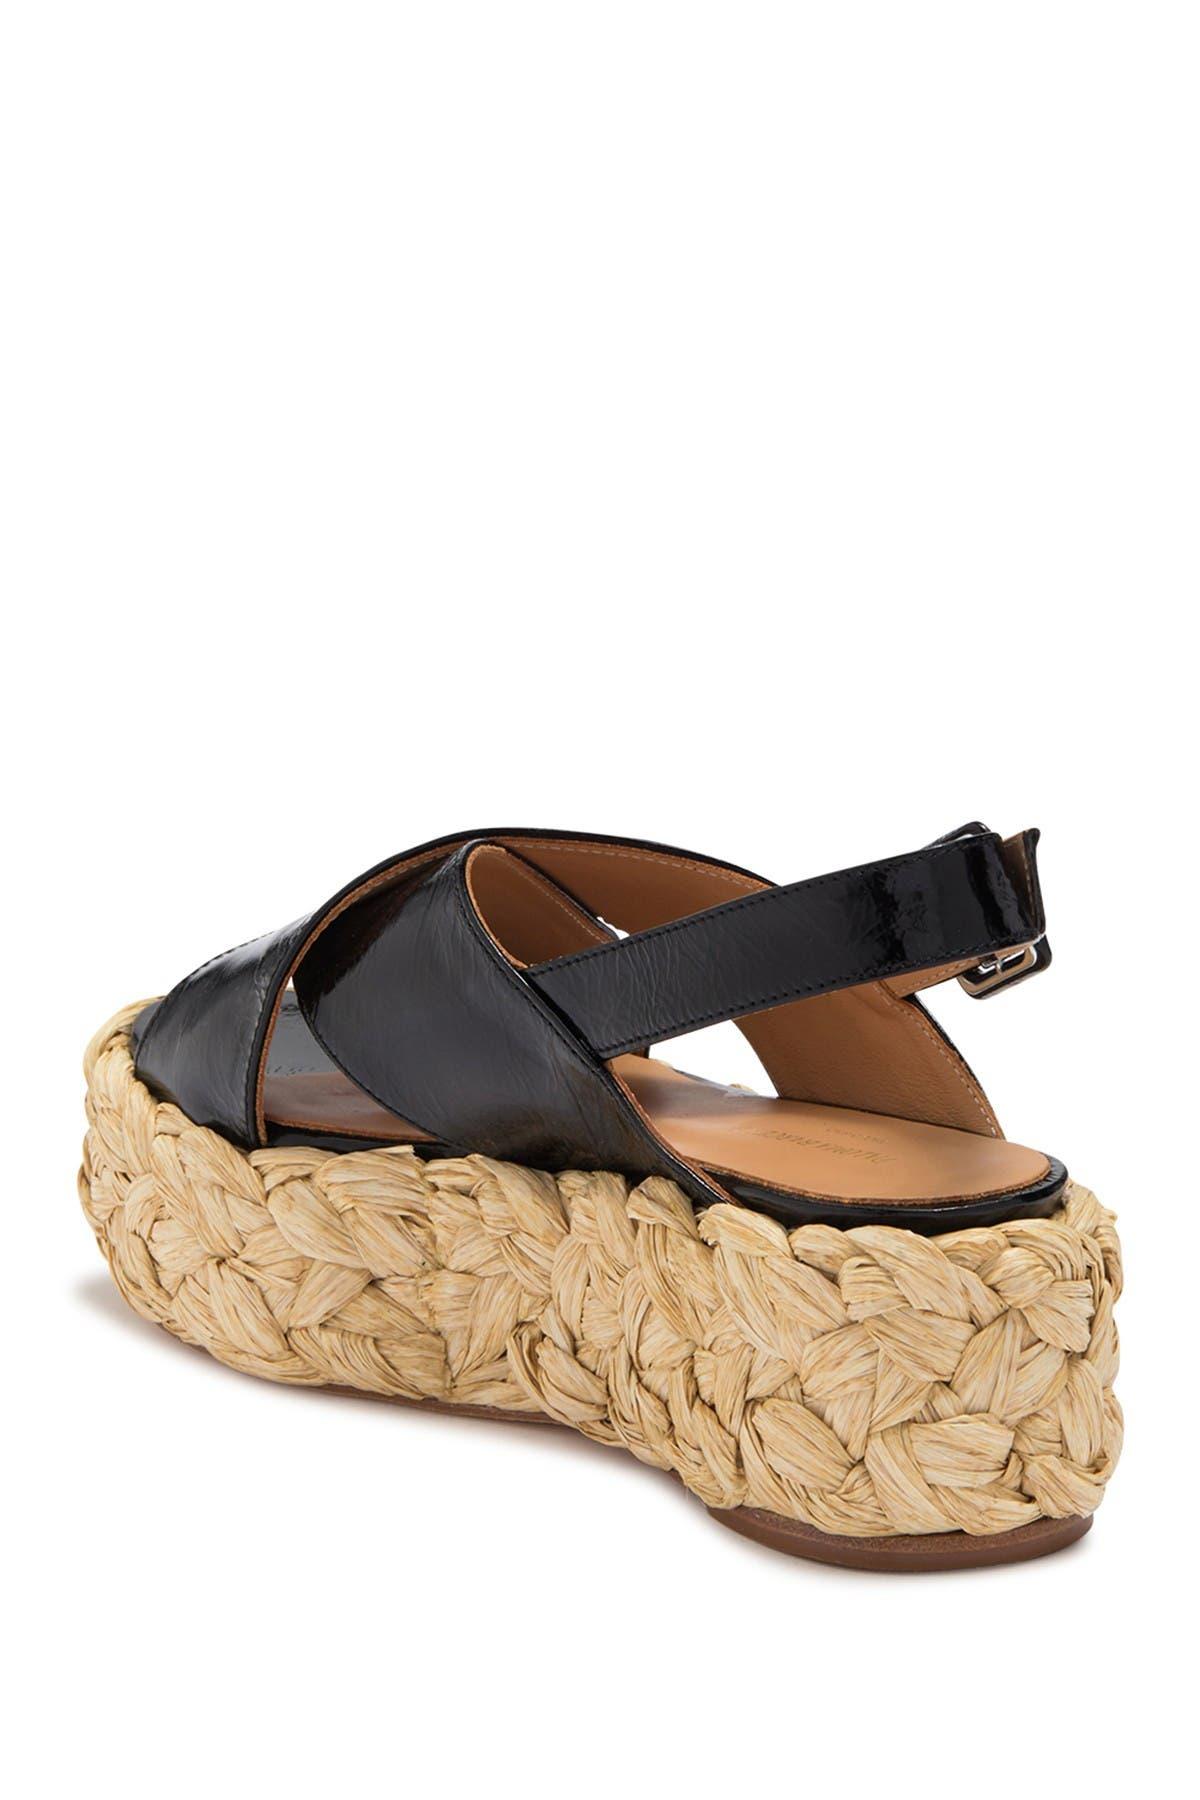 Image of Paloma Barcelo Aria Patent Leather Espadrille Sandal